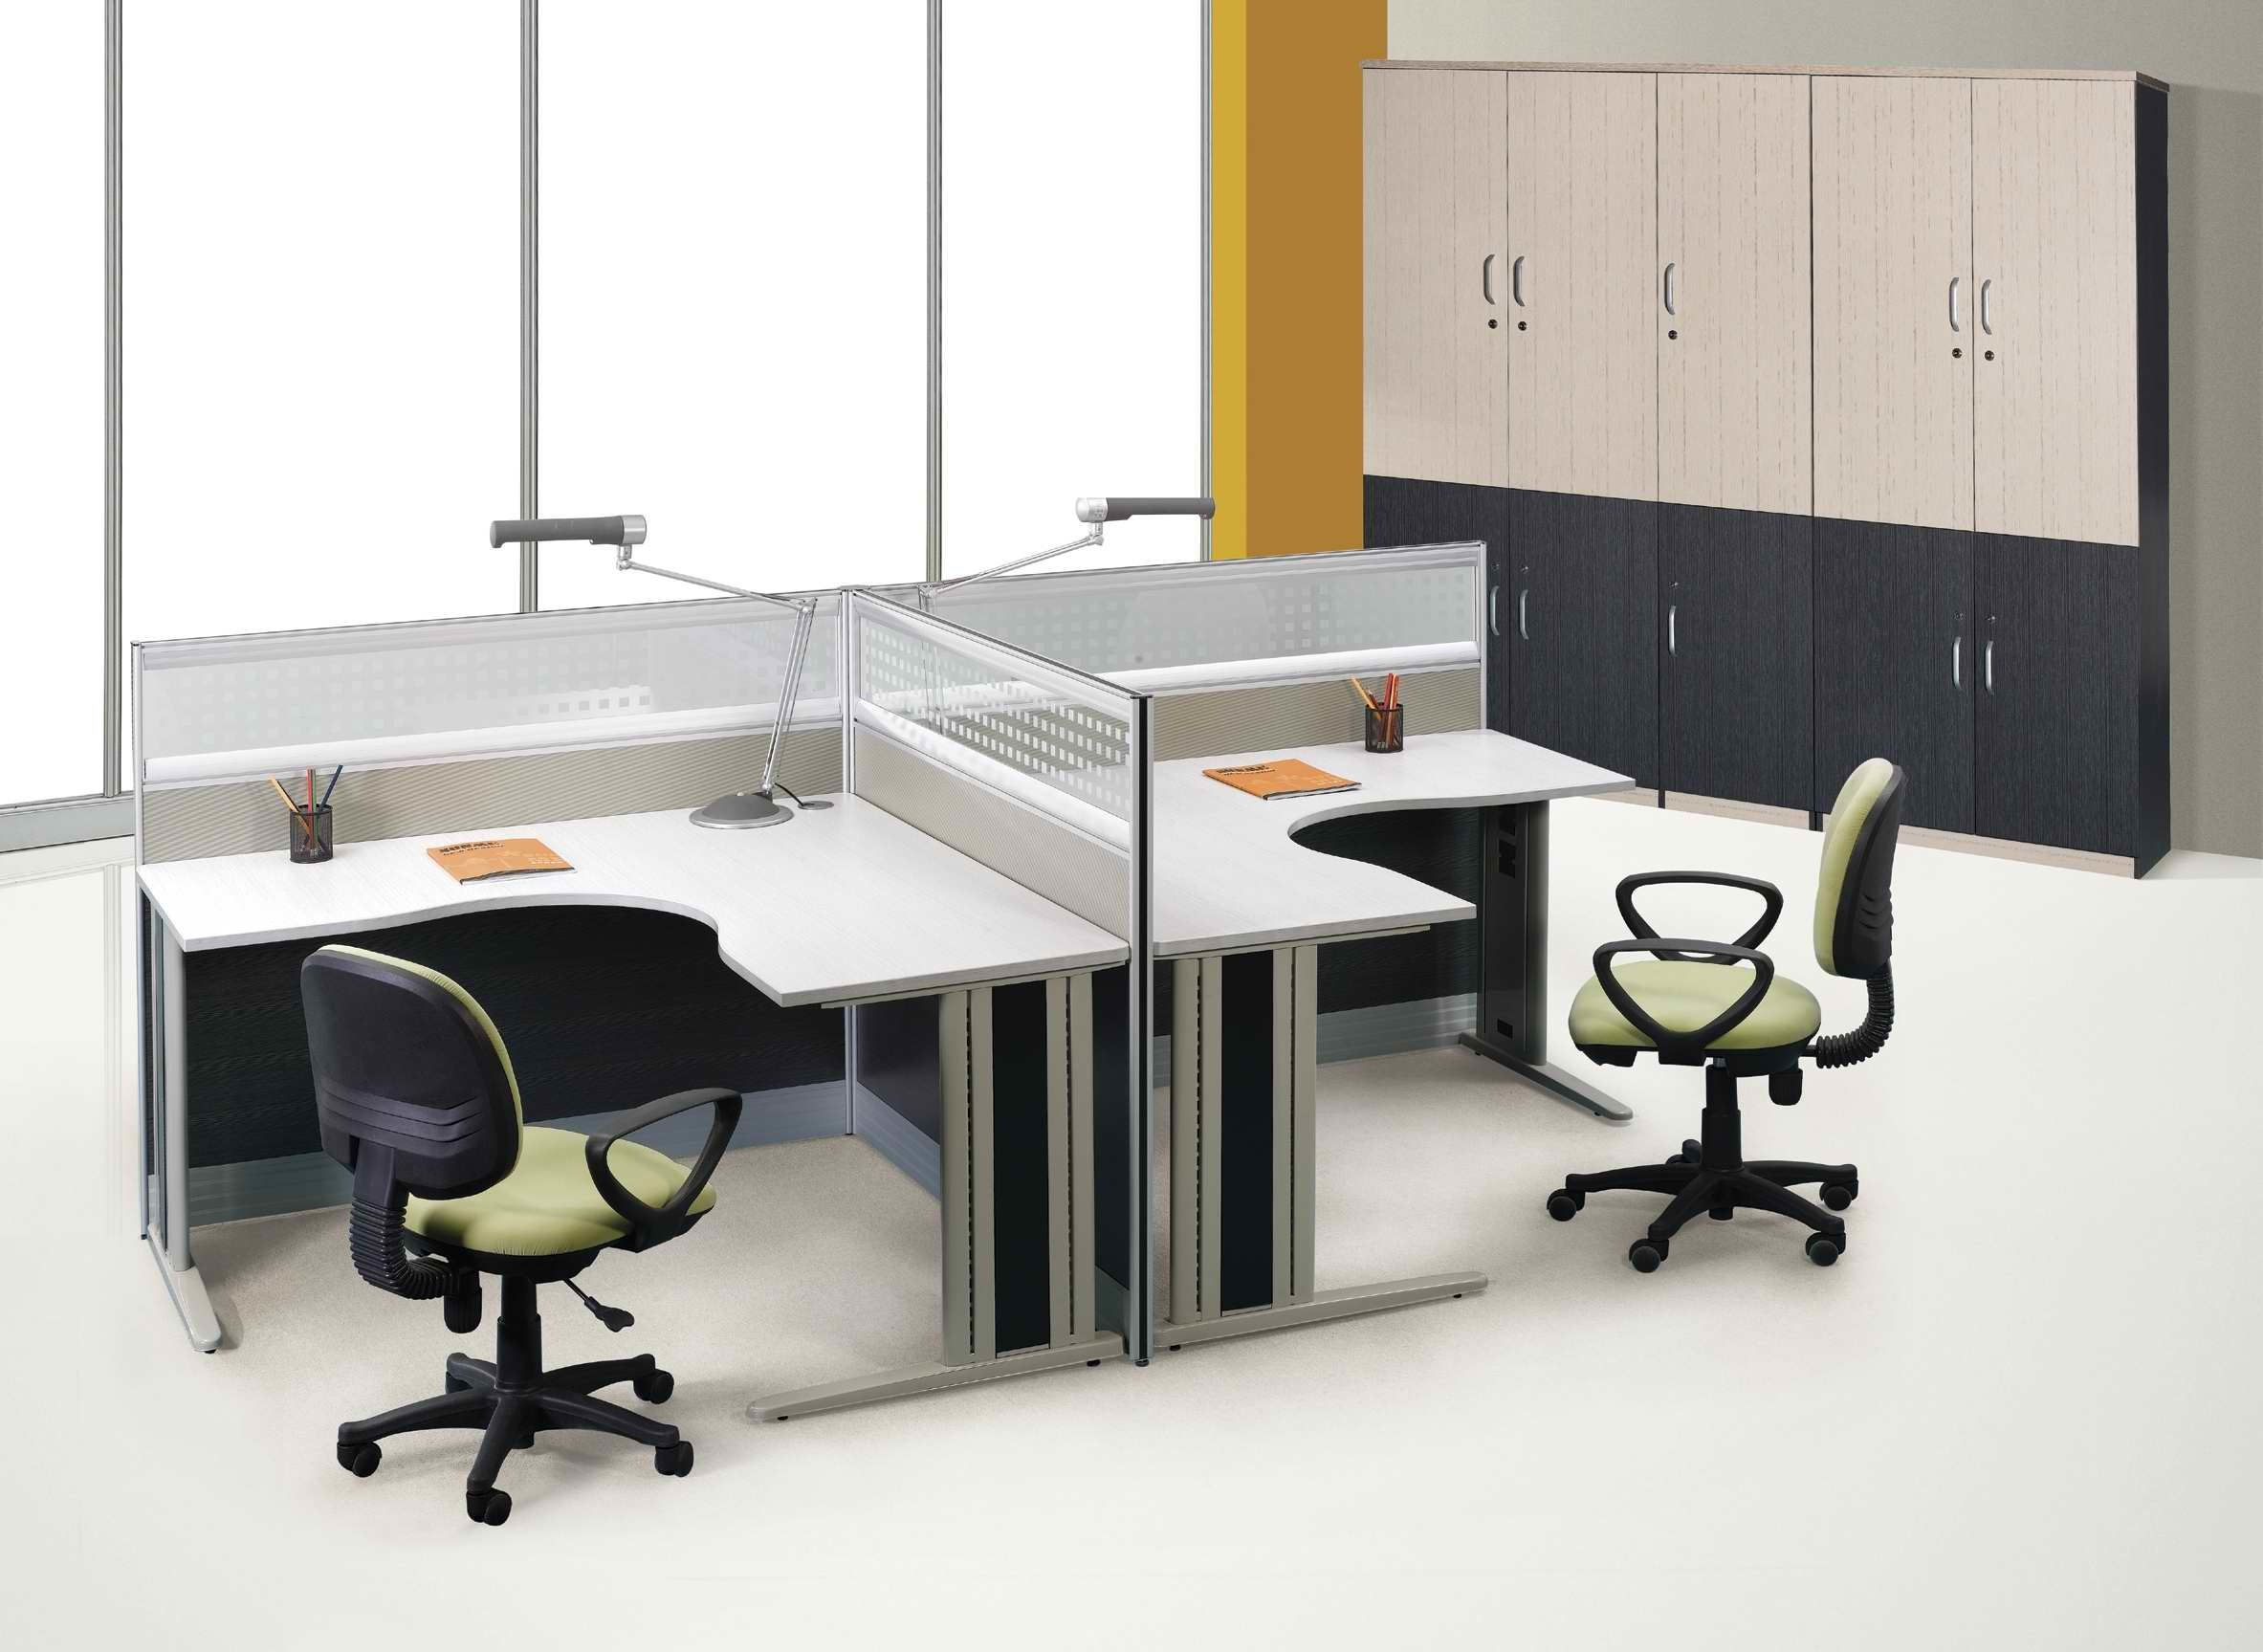 26 Lastest Tall Office Desks